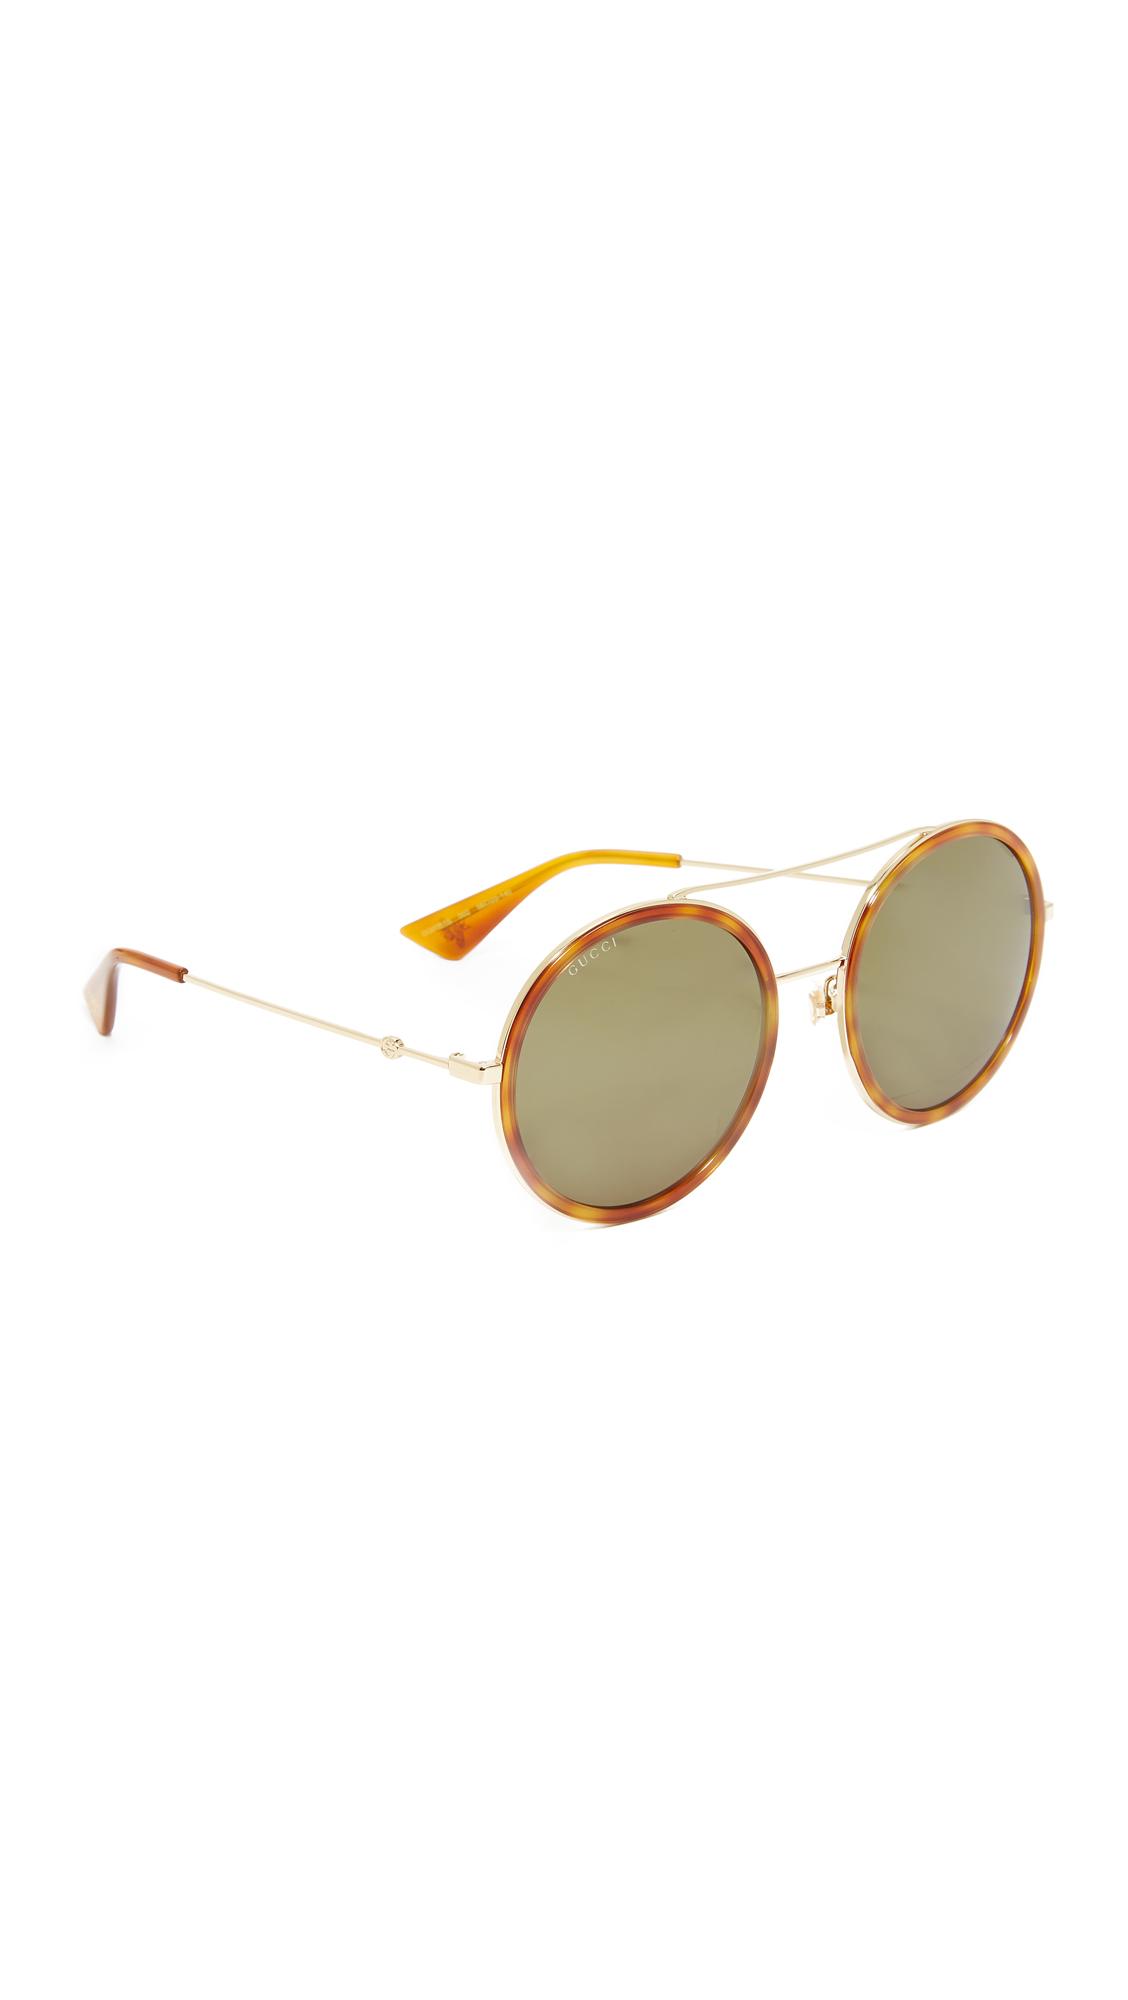 Gucci Urban Web Block Round Aviator Sunglasses - Gold/Green at Shopbop